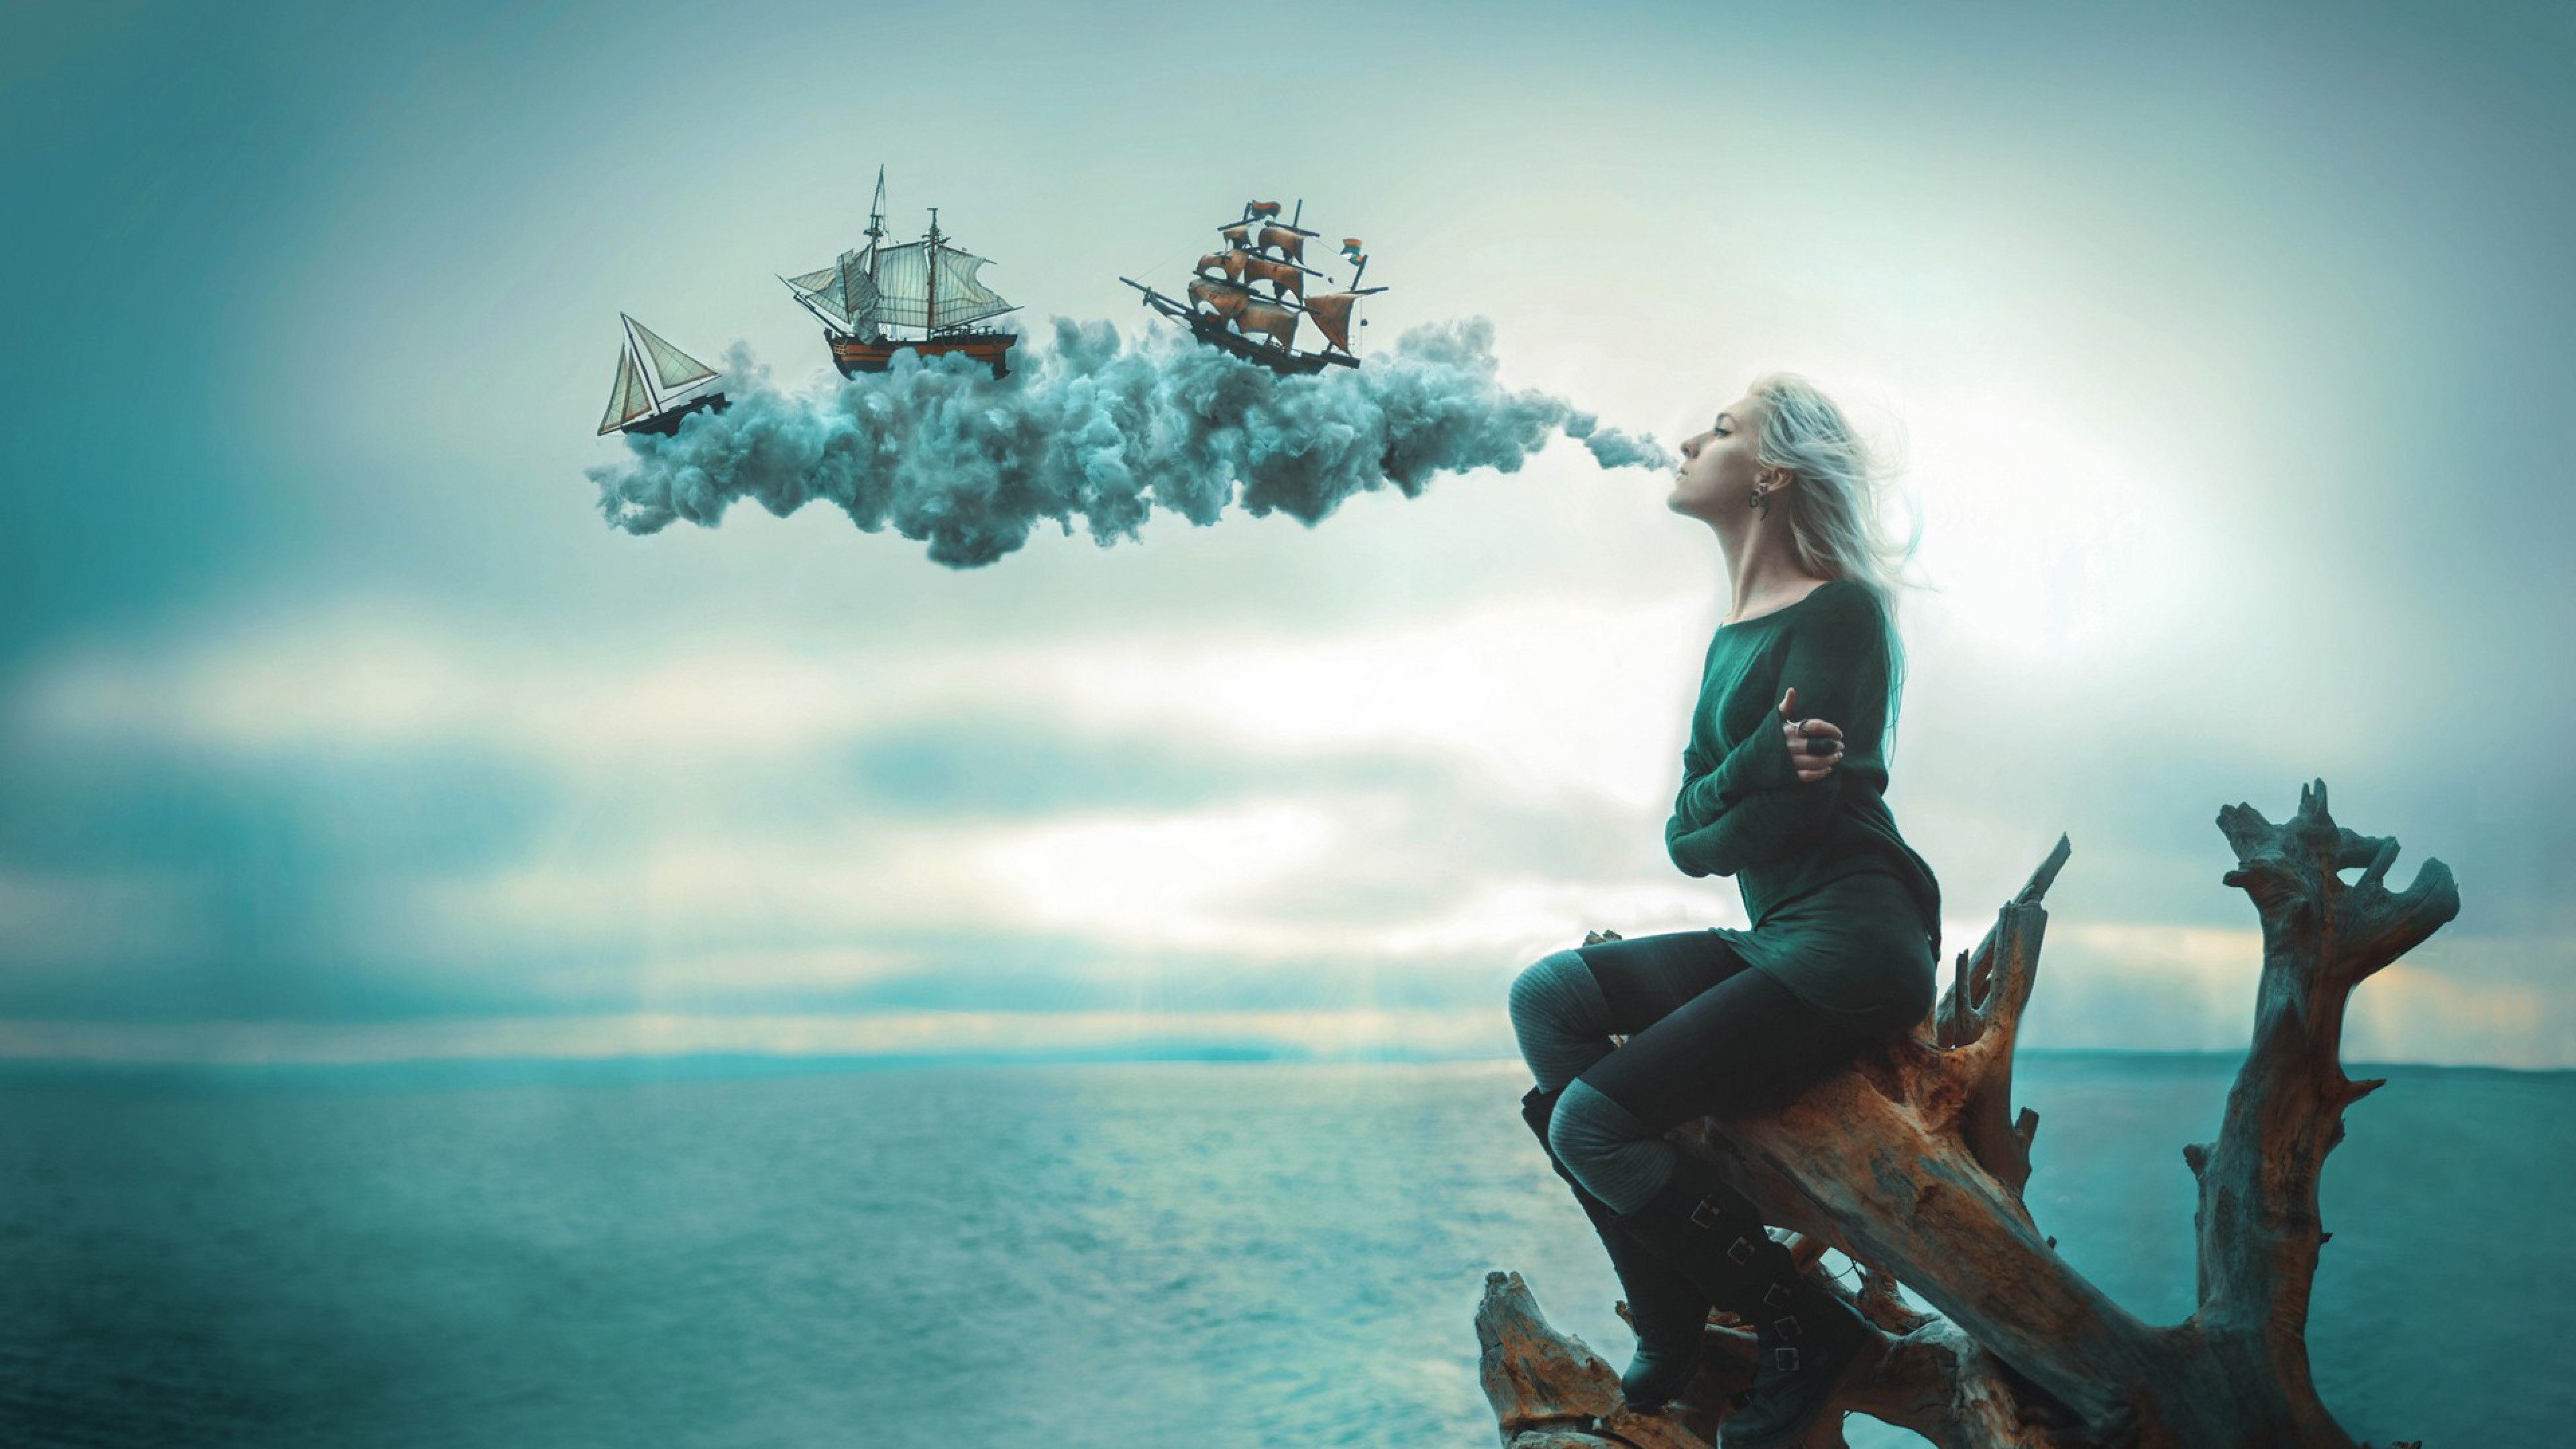 sailing ships sea smoke 4k 1540748323 - Sailing Ships Sea Smoke 4k - smoke wallpapers, ship wallpapers, sea wallpapers, digital art wallpapers, artist wallpapers